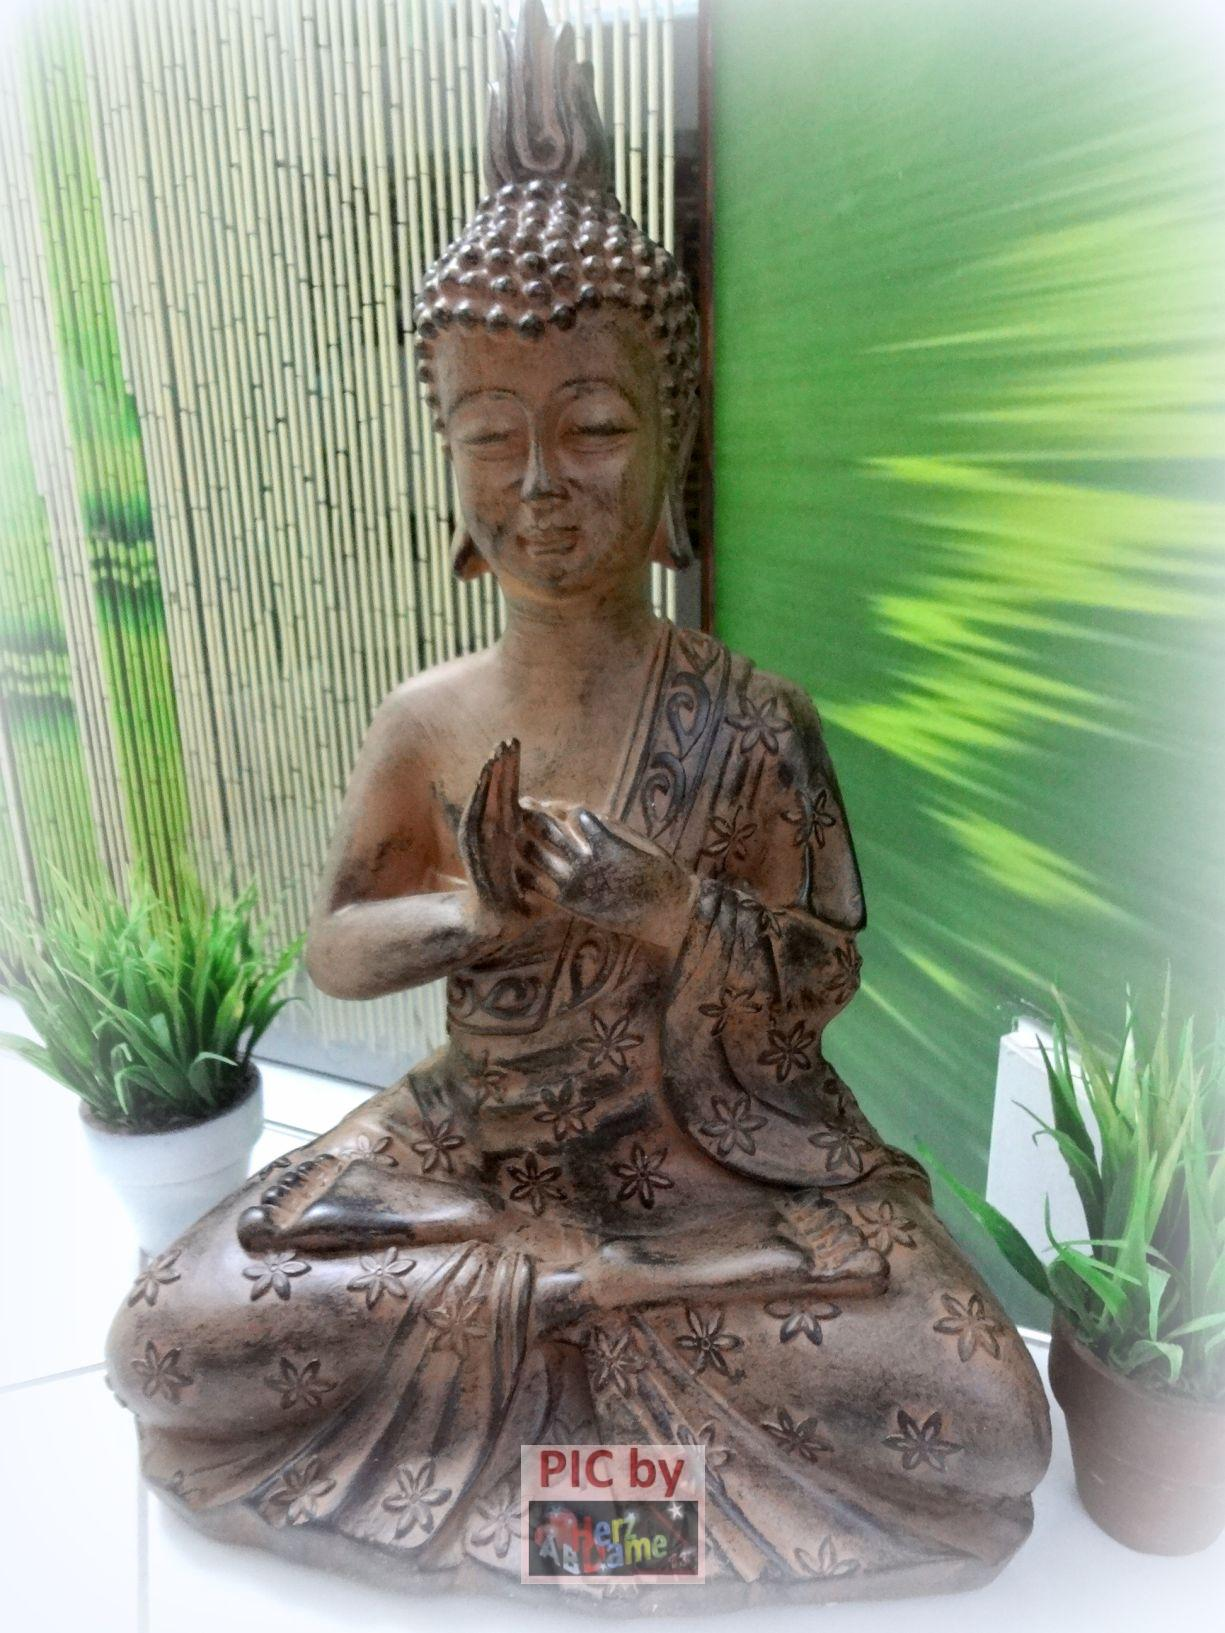 ab448d xl 42cm figur skulptur deko meditation buddha feng shui holz optik neu ebay. Black Bedroom Furniture Sets. Home Design Ideas